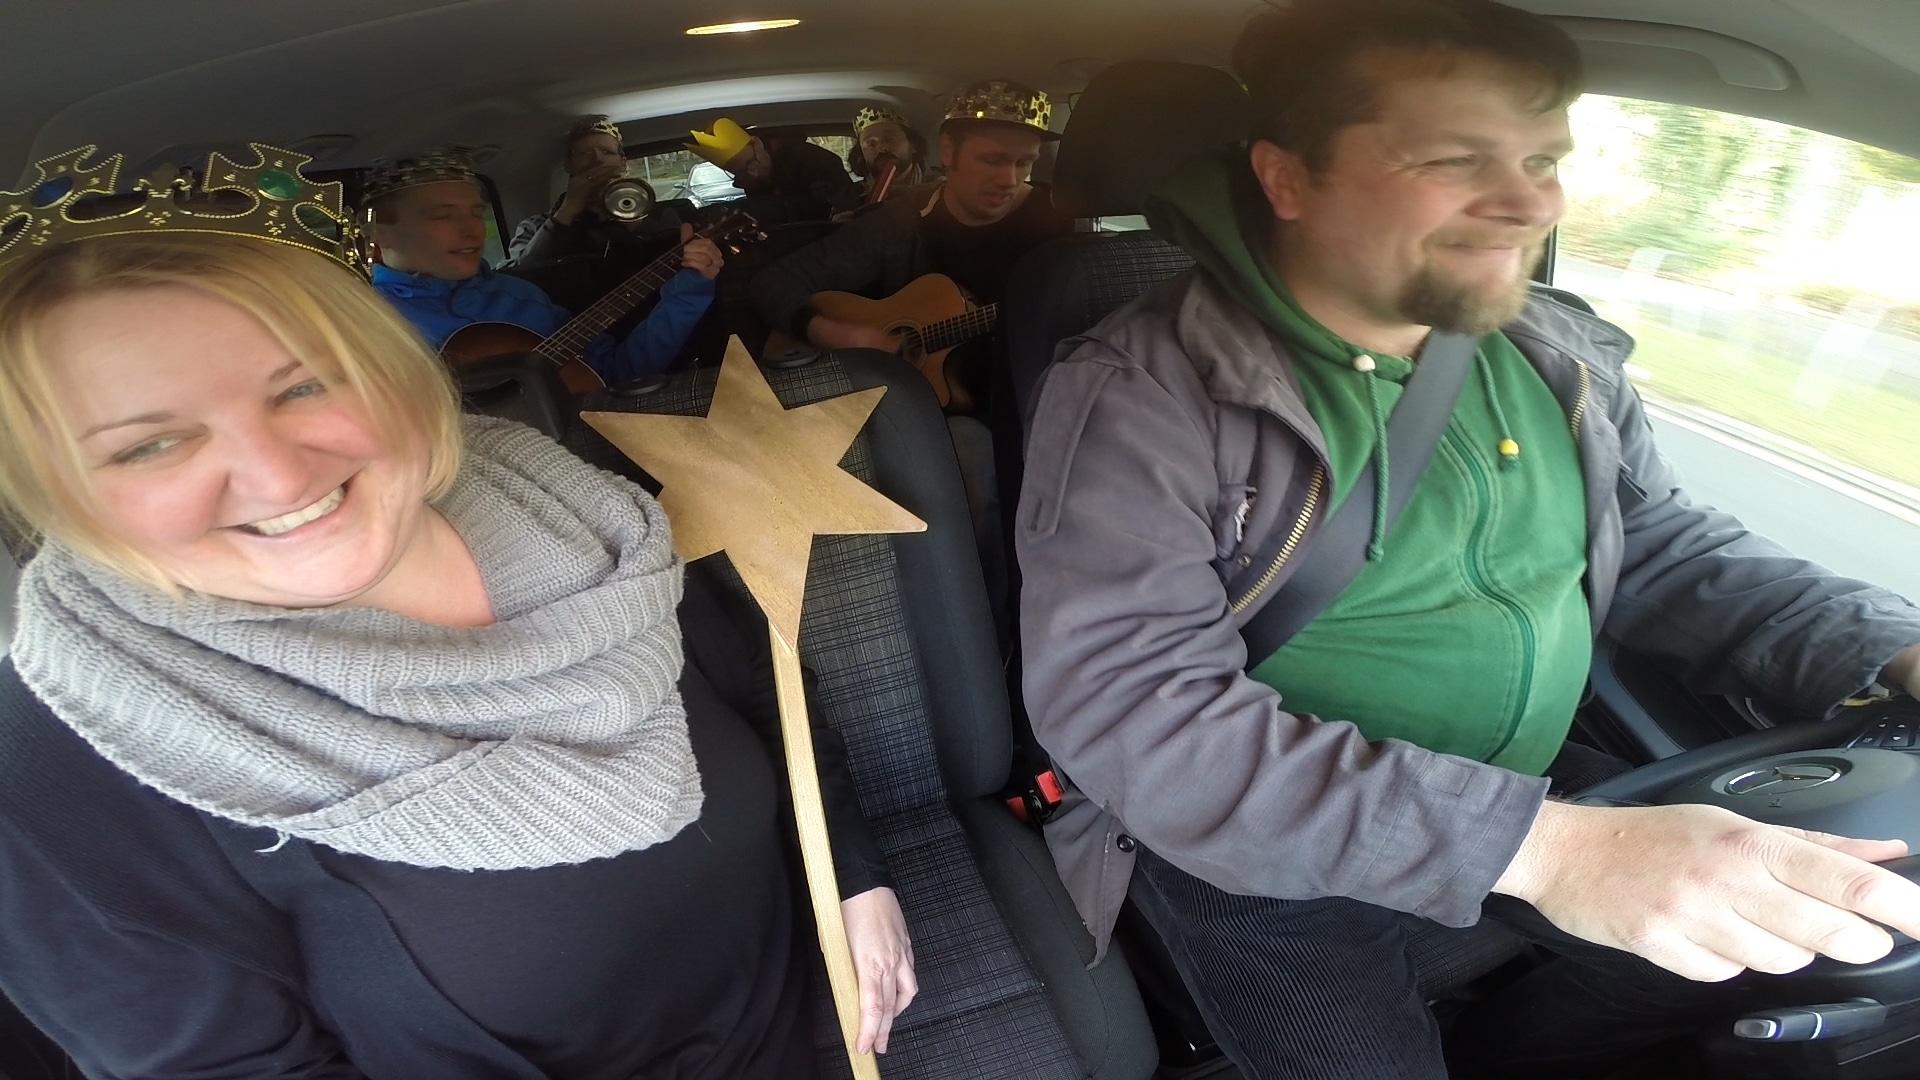 Sternsinger-Karaoke im Auto